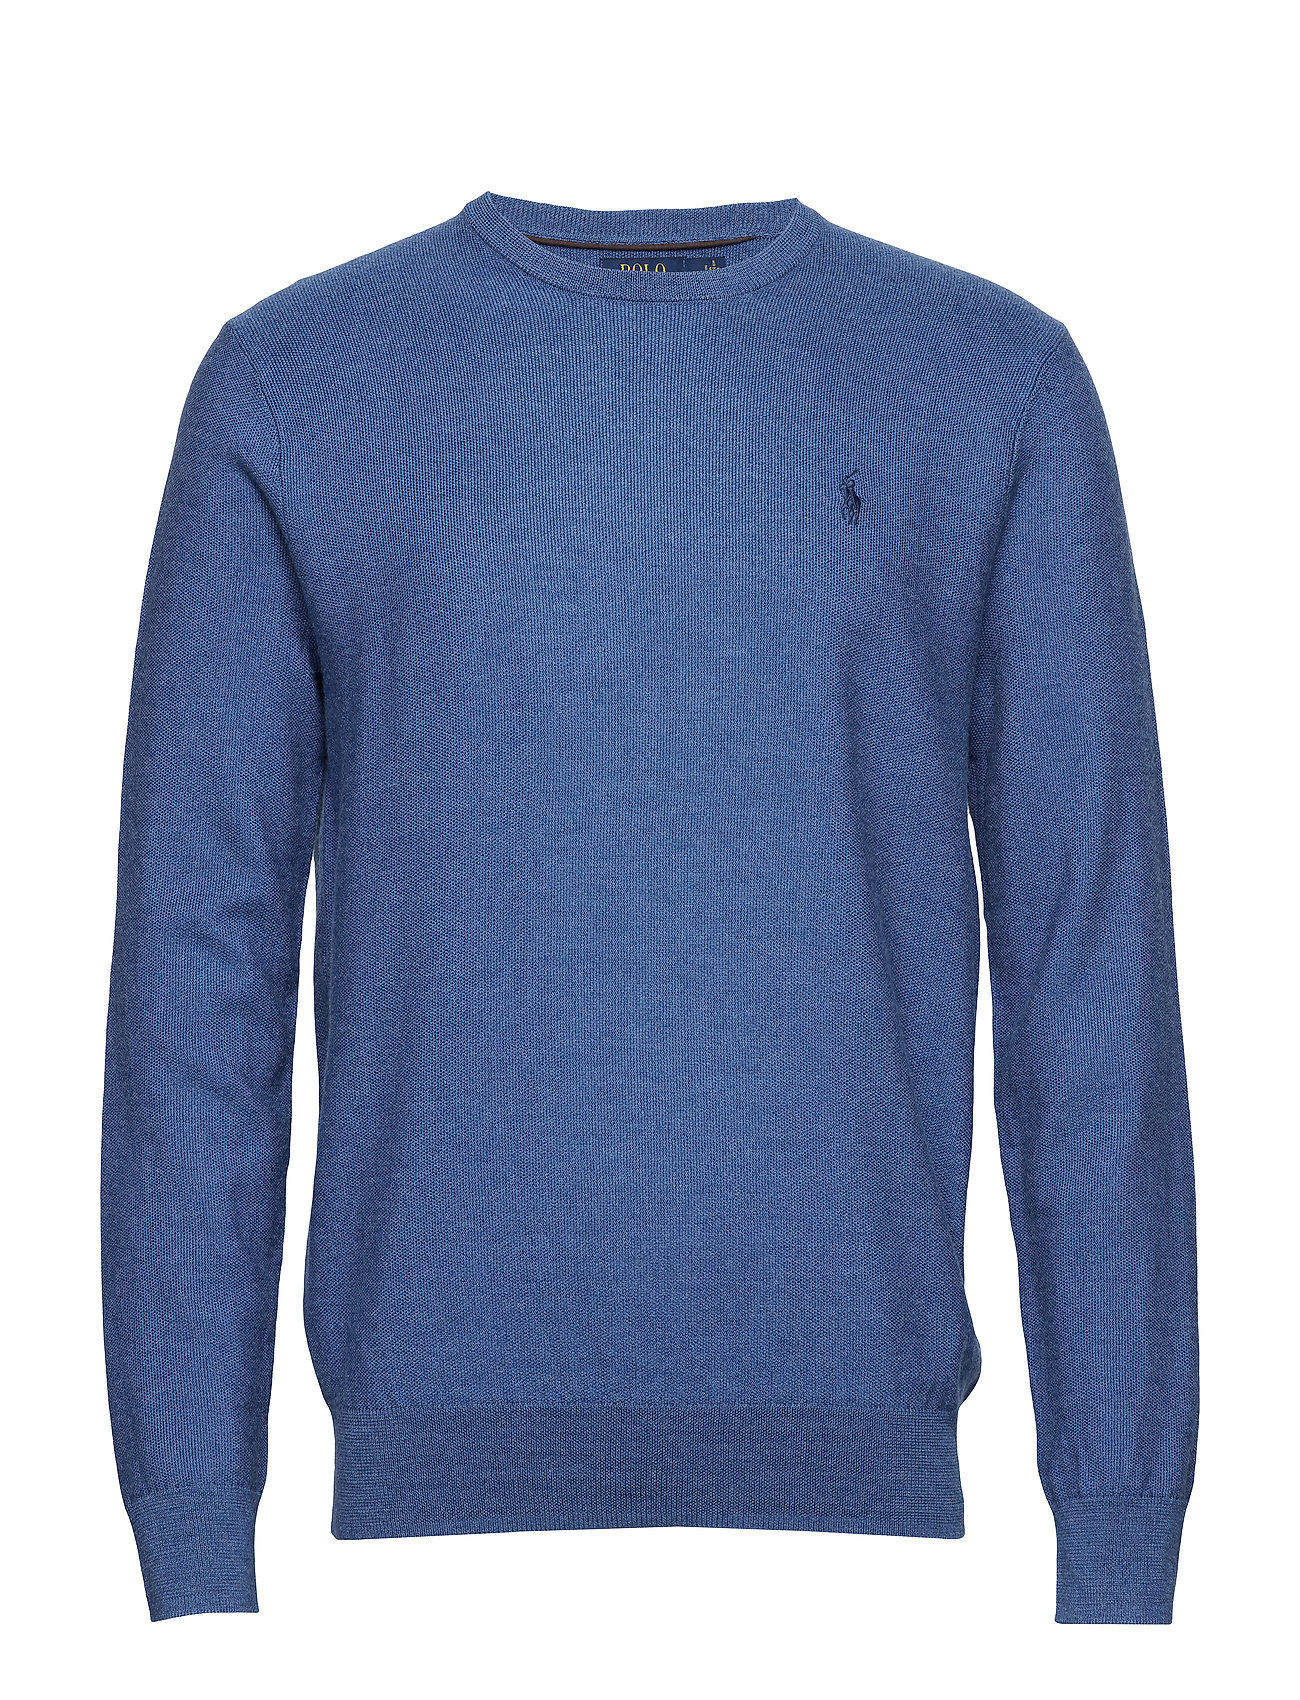 Polo Ralph Lauren Merino-Silk-Cashmere Sweater - FOG BLUE HEATHER